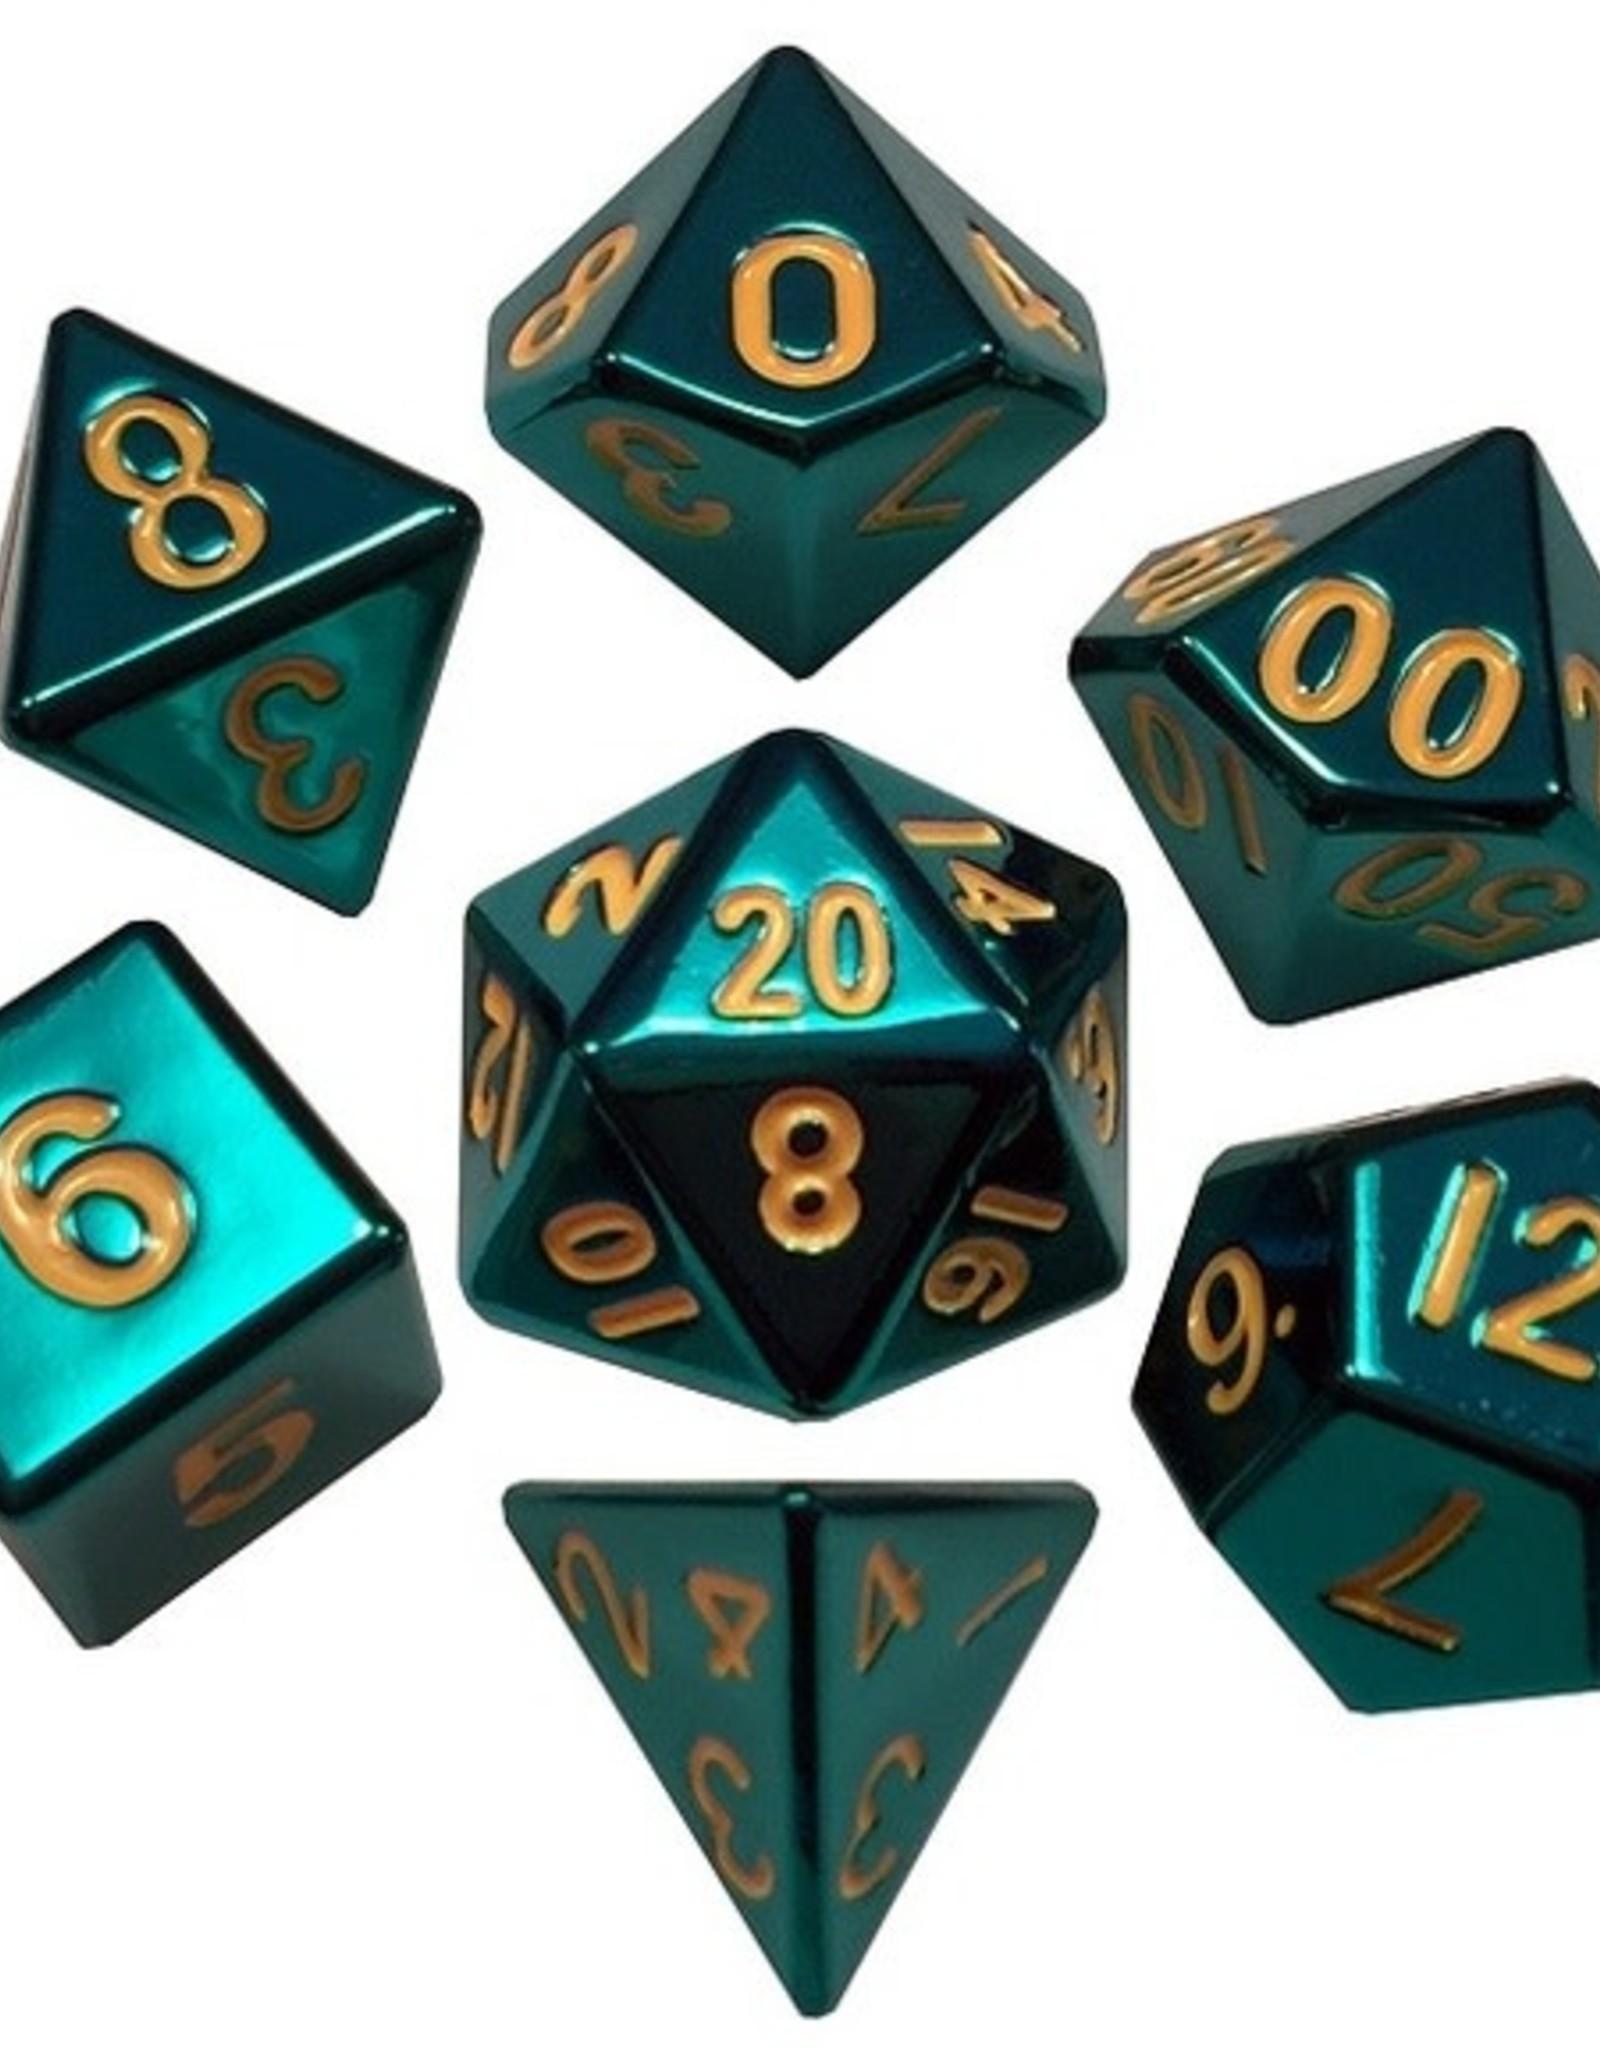 Metallic Dice Games Poly Metal Dice Set Turquoise